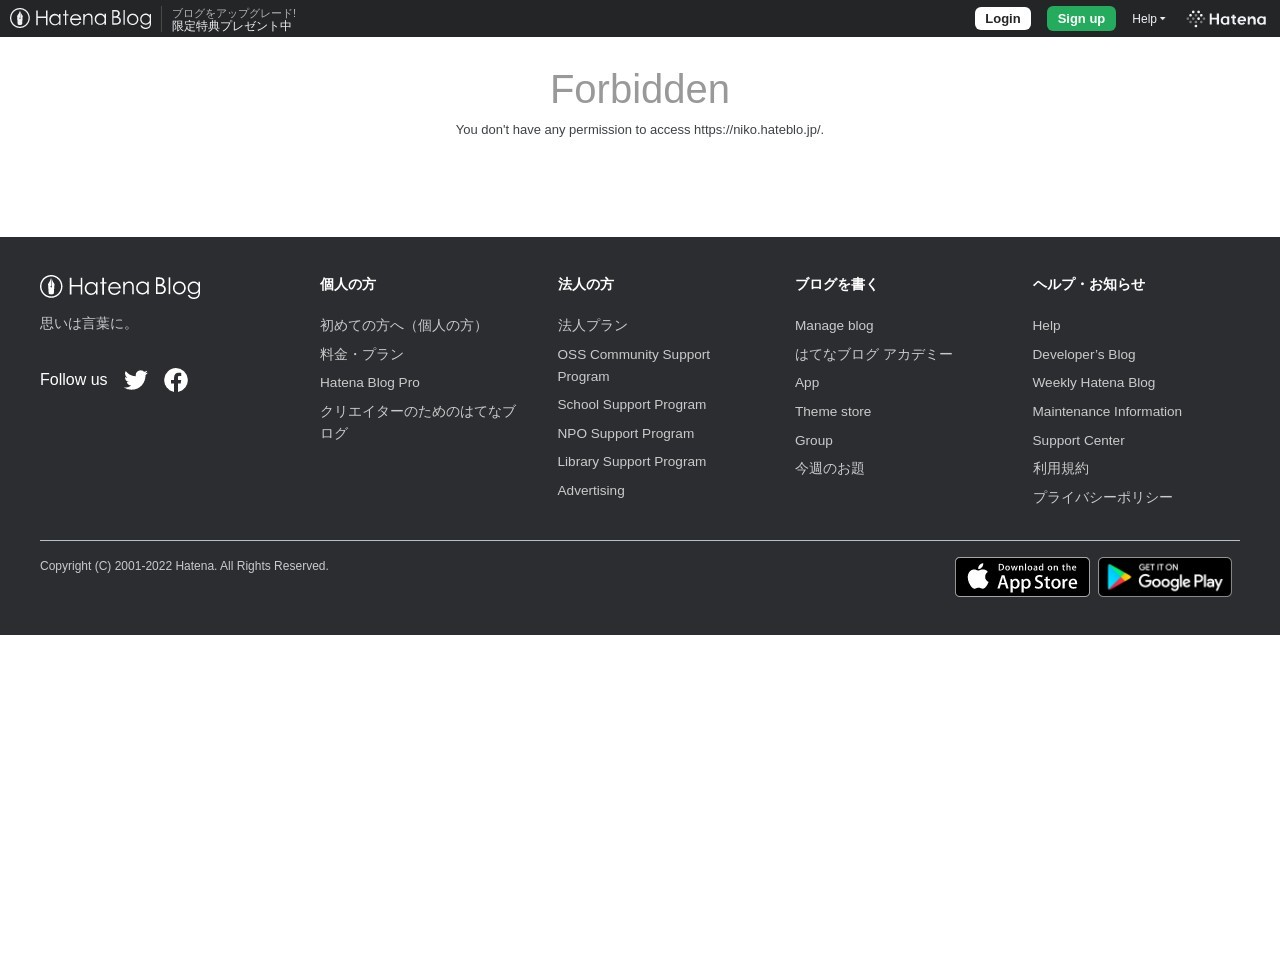 http://niko.hateblo.jp/entry/2015/10/02/231540